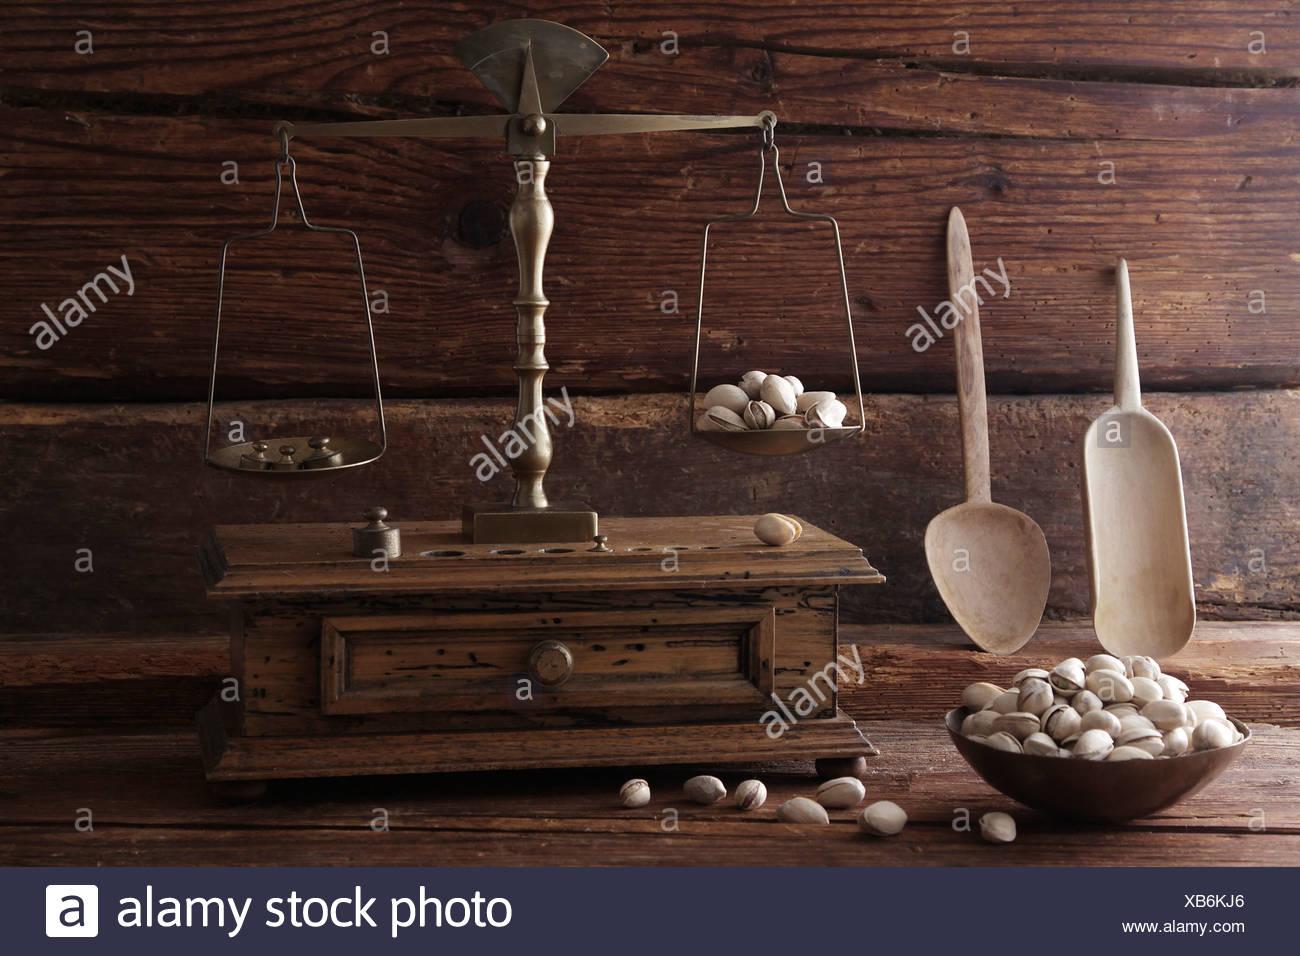 Antique scales weighing Pistachio (Pistacia vera) Stock Photo